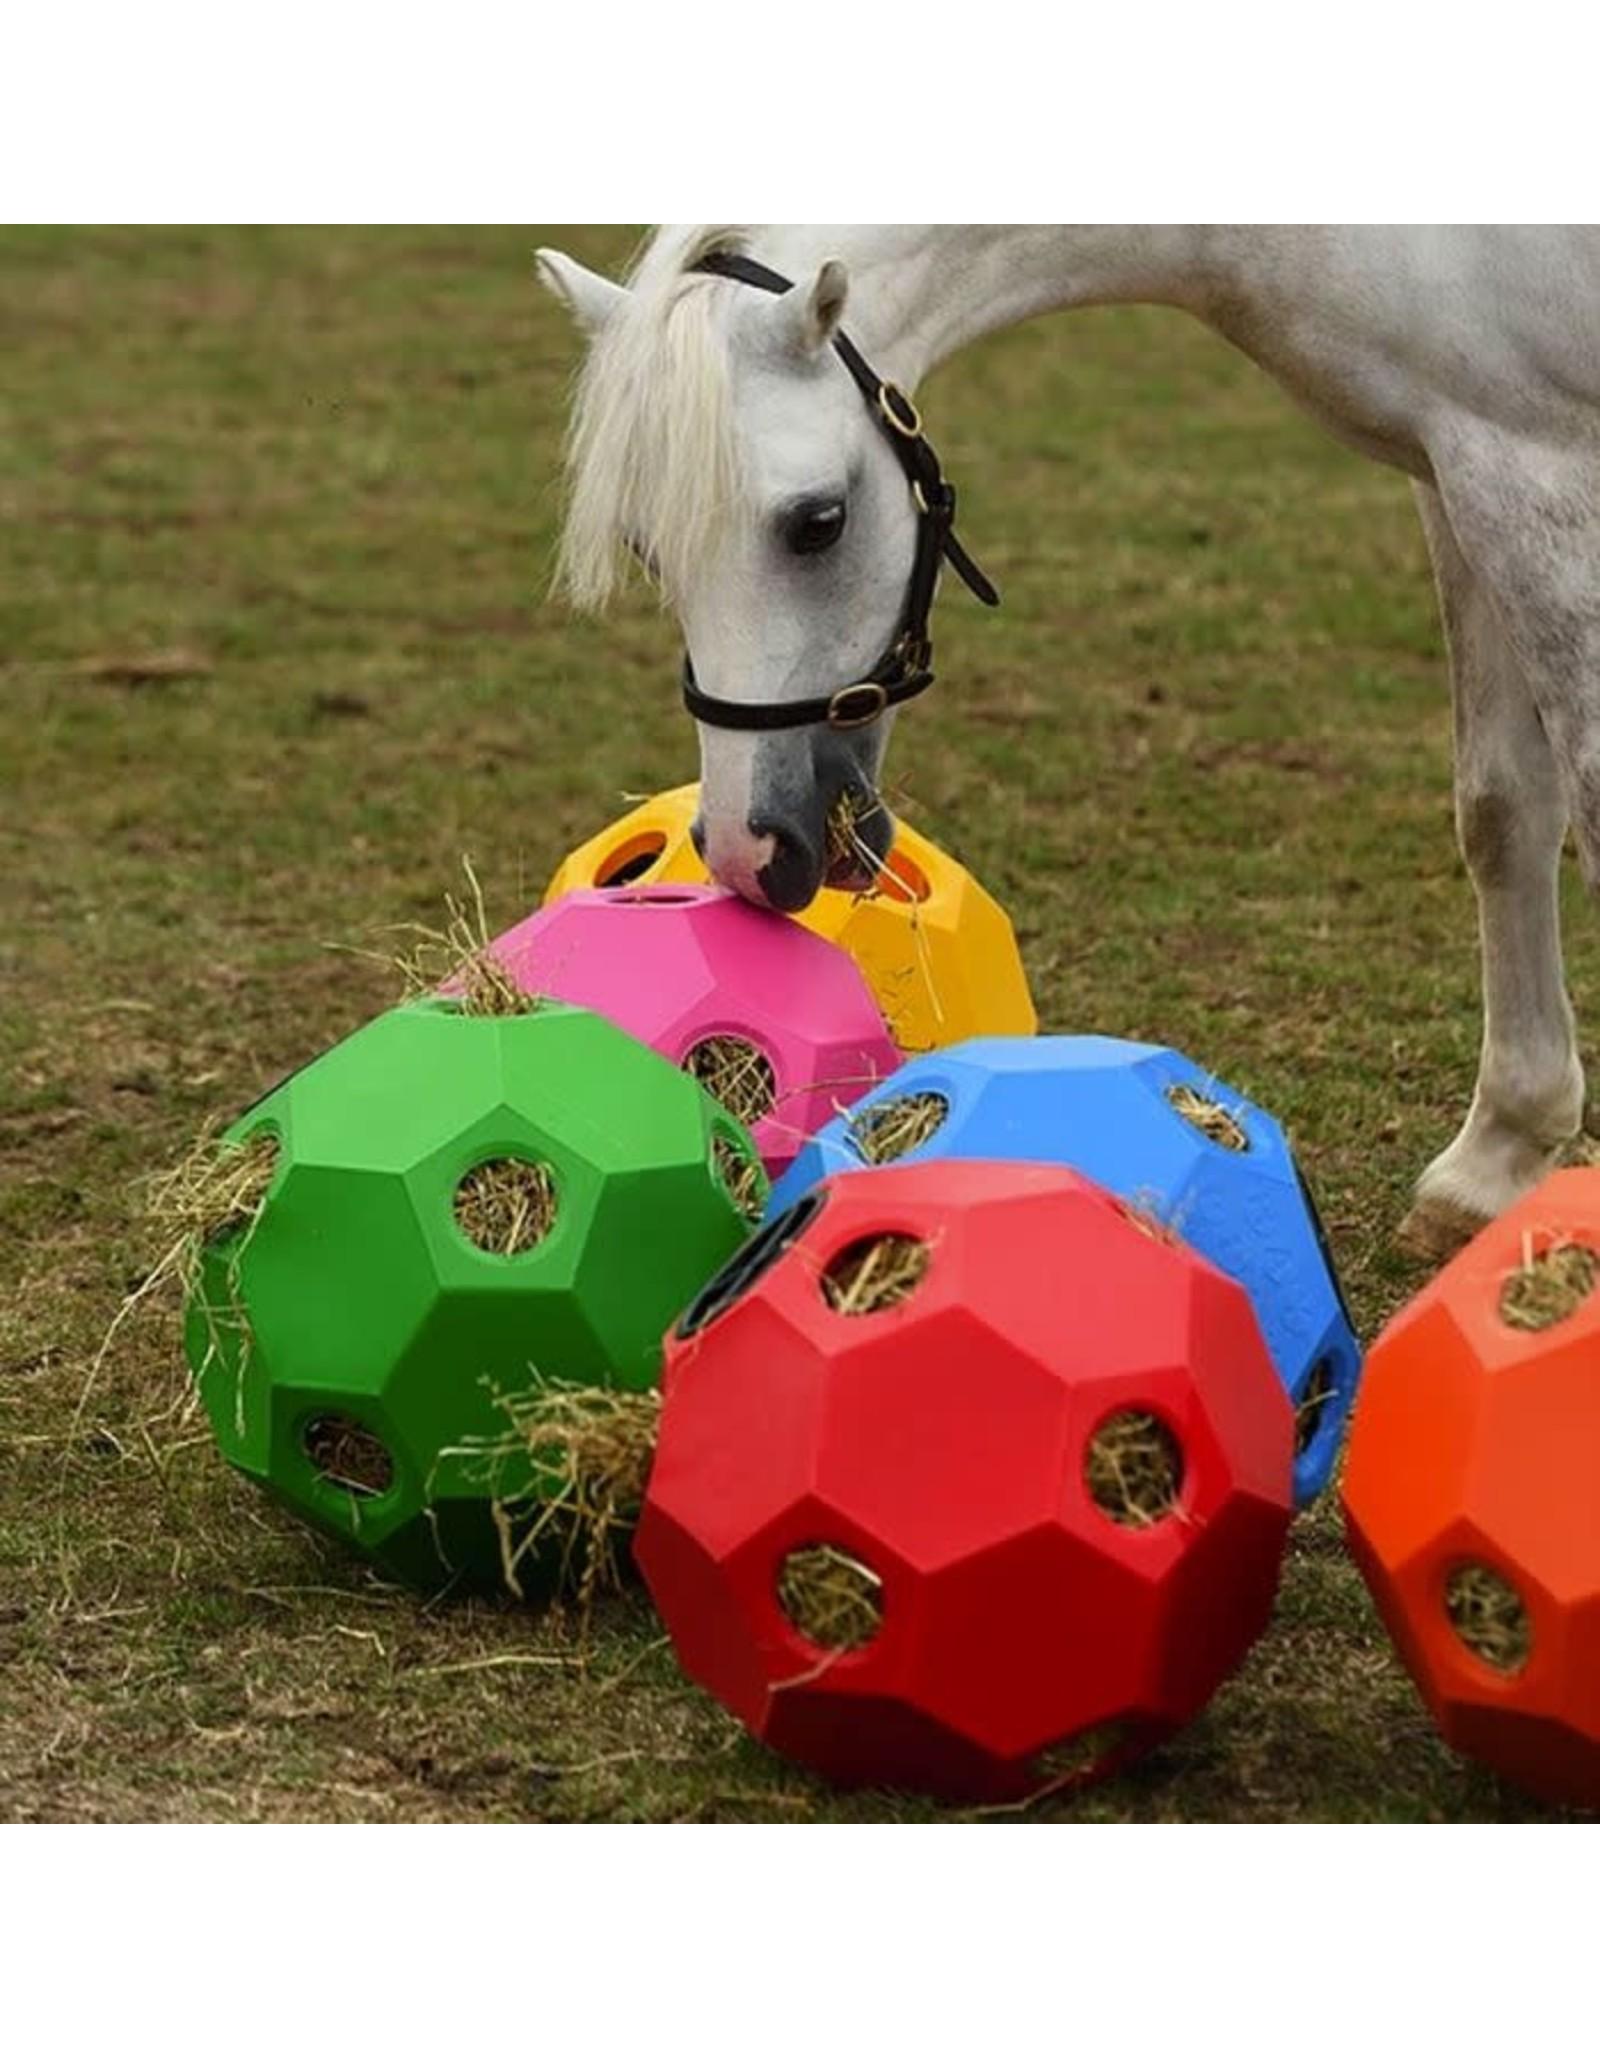 Hay Play Horse Feeder Ball